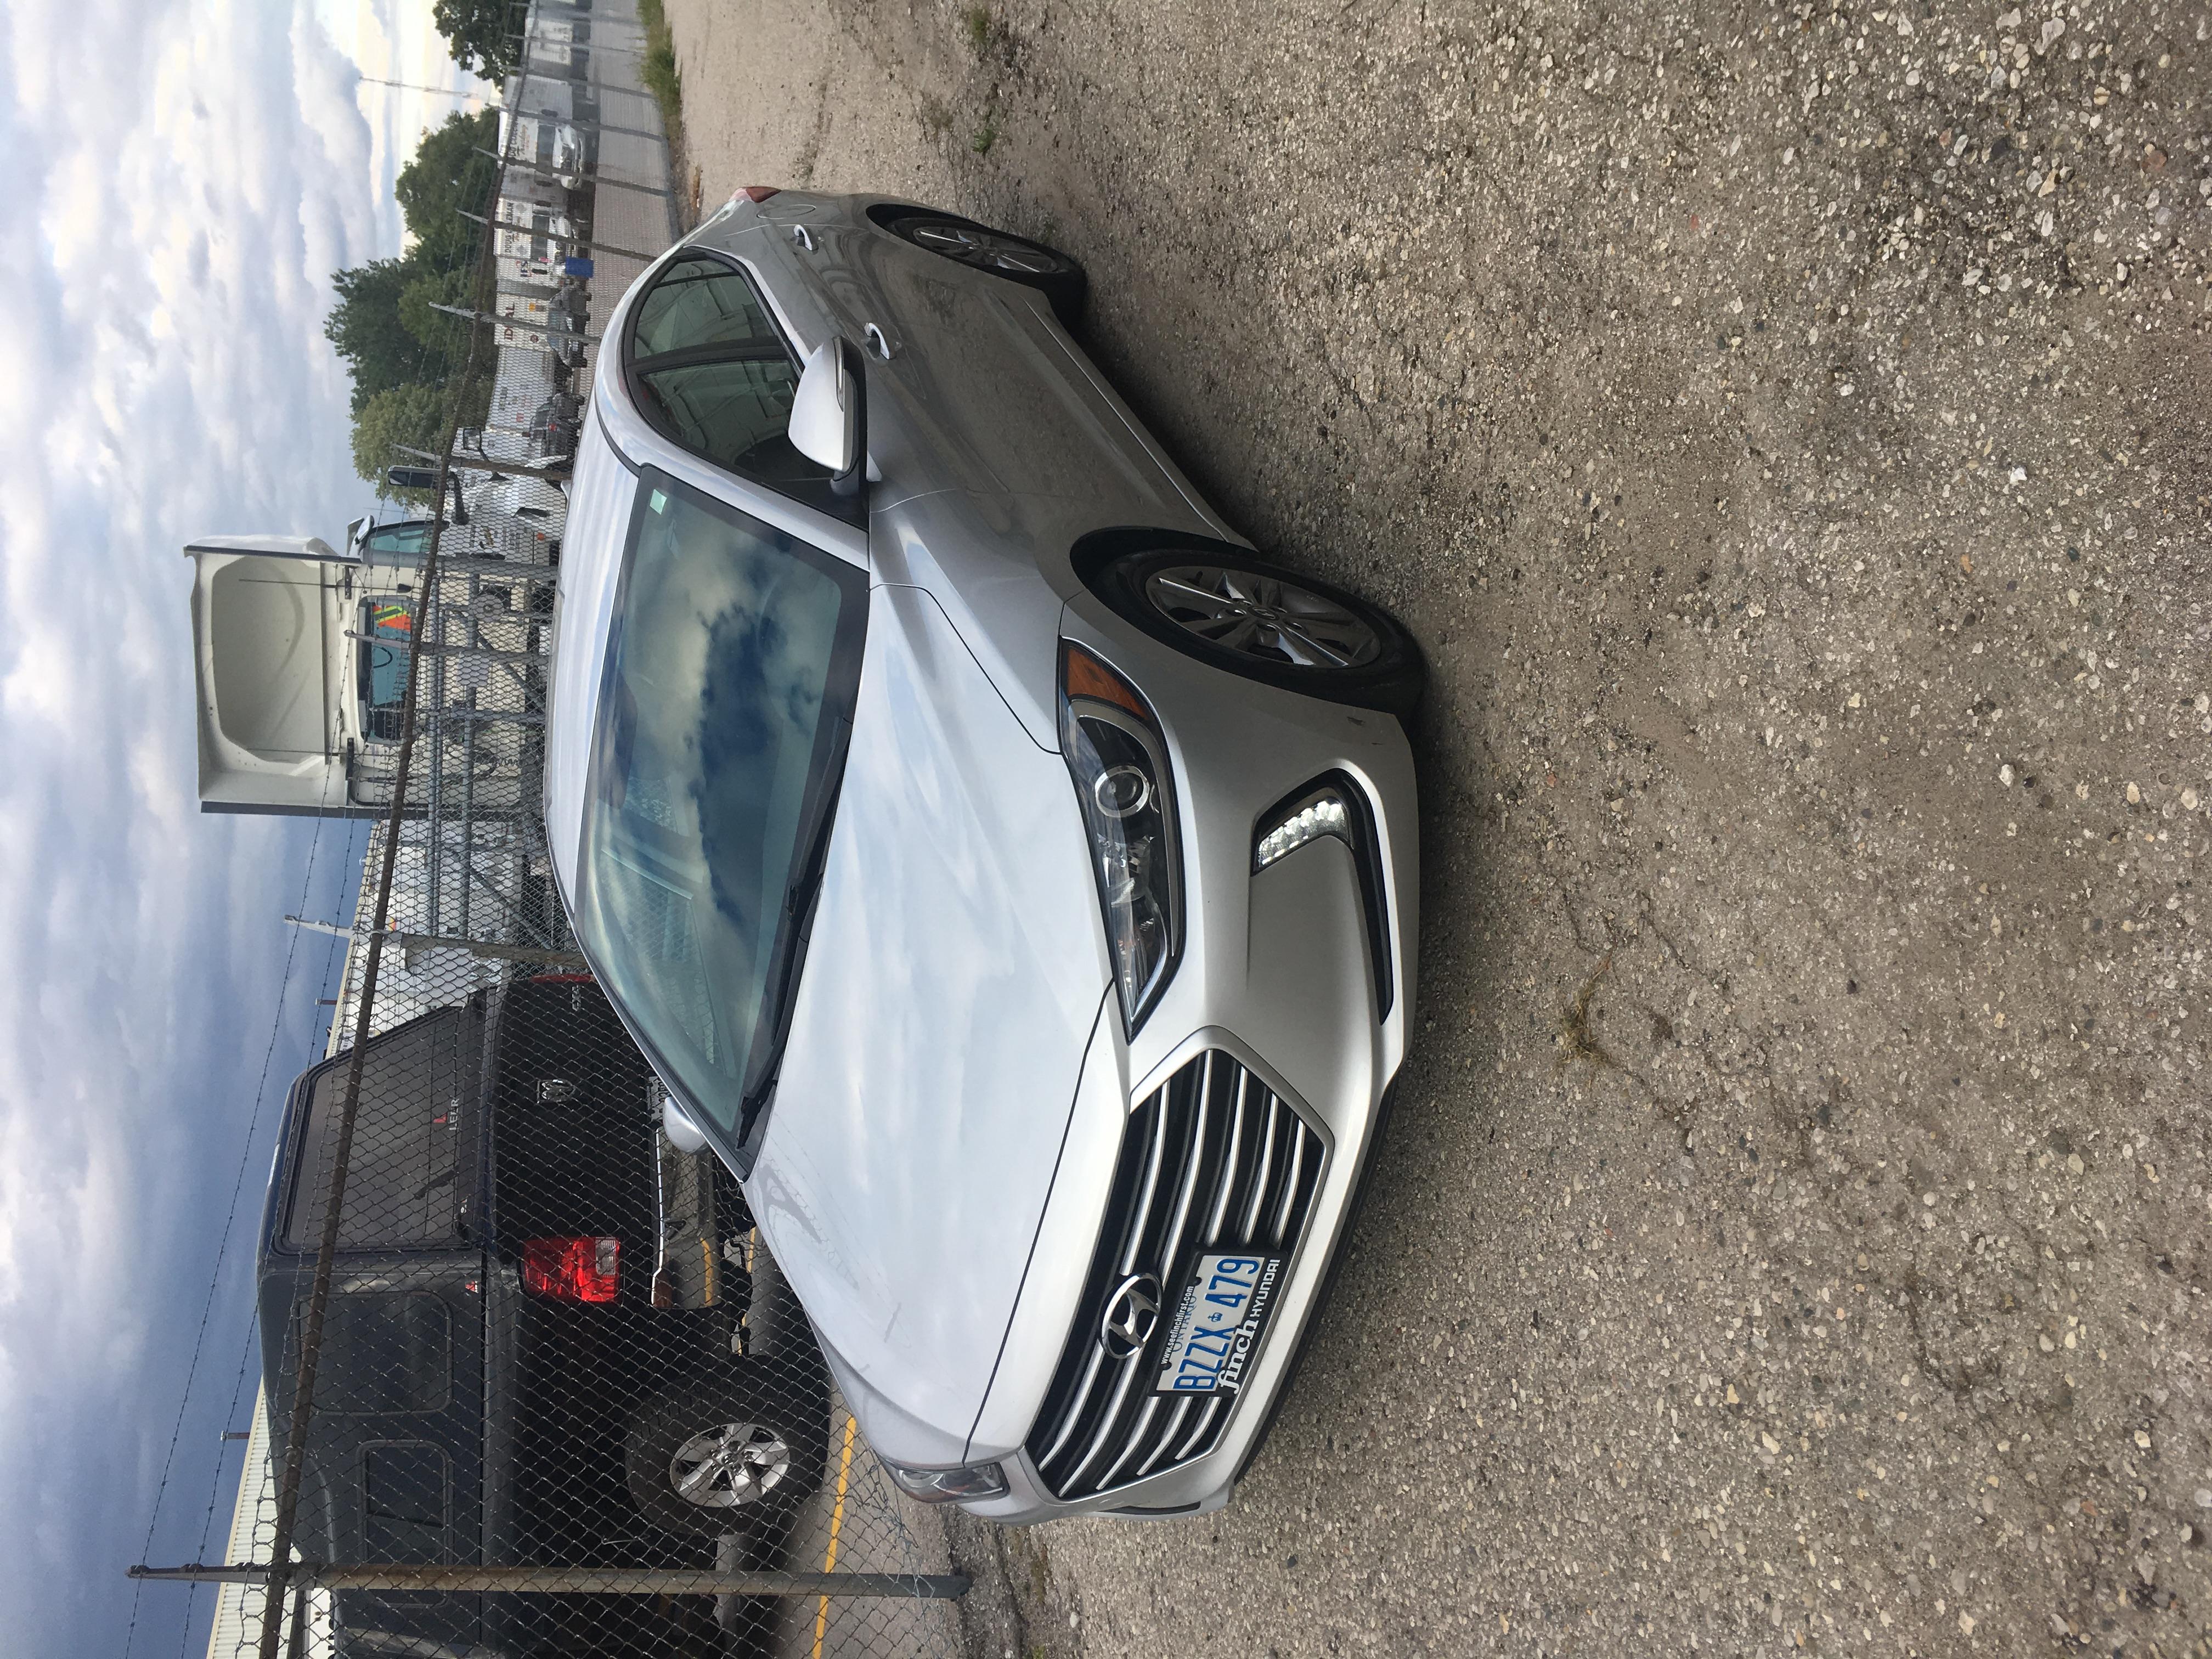 2017 Hyundai Elantra Bailiff Auction